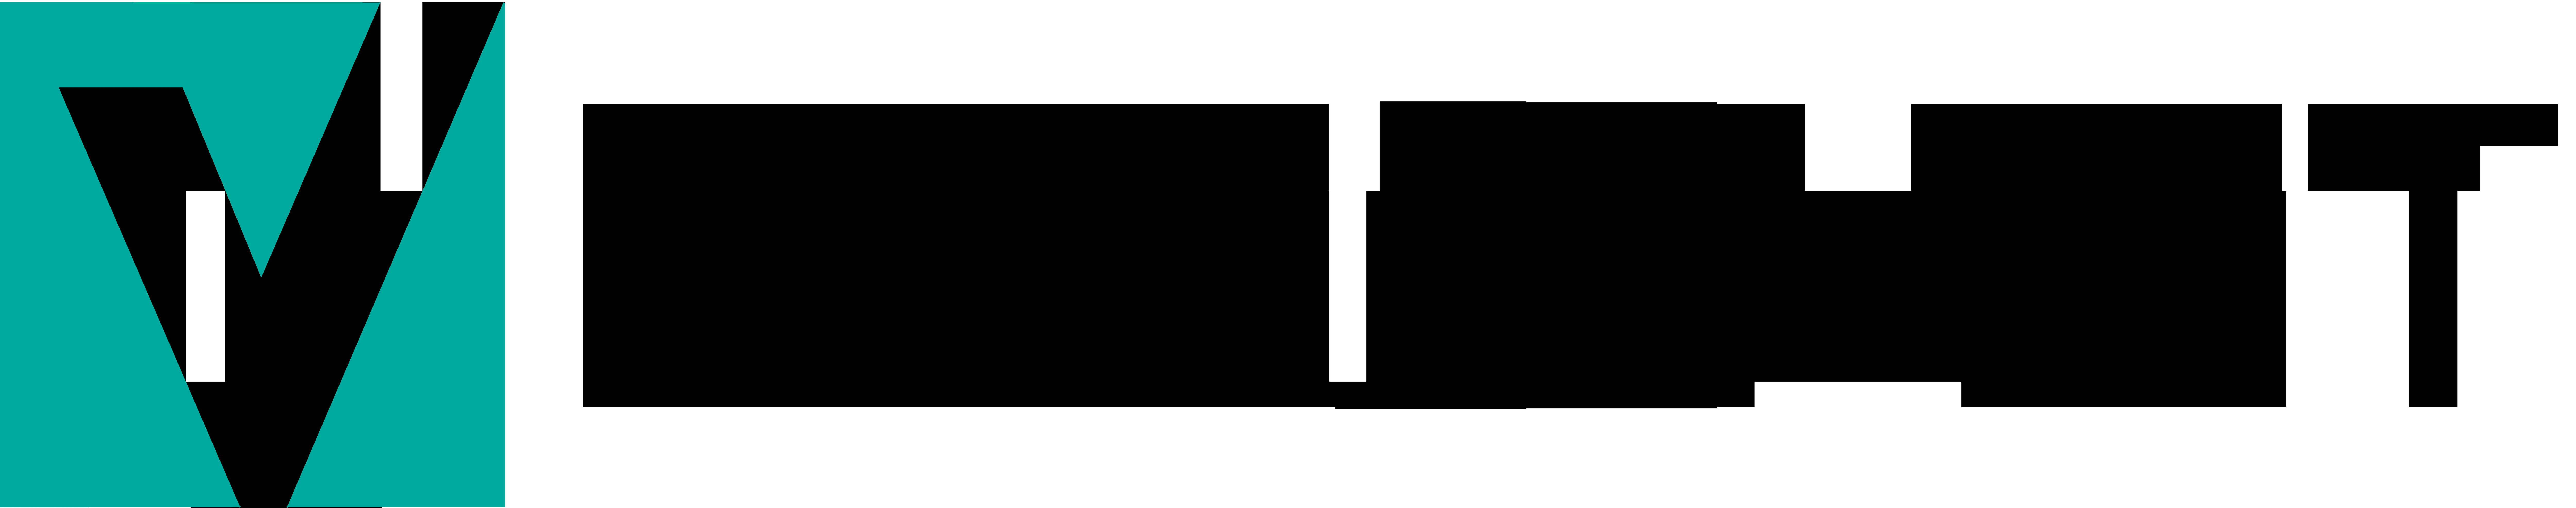 Vetromet